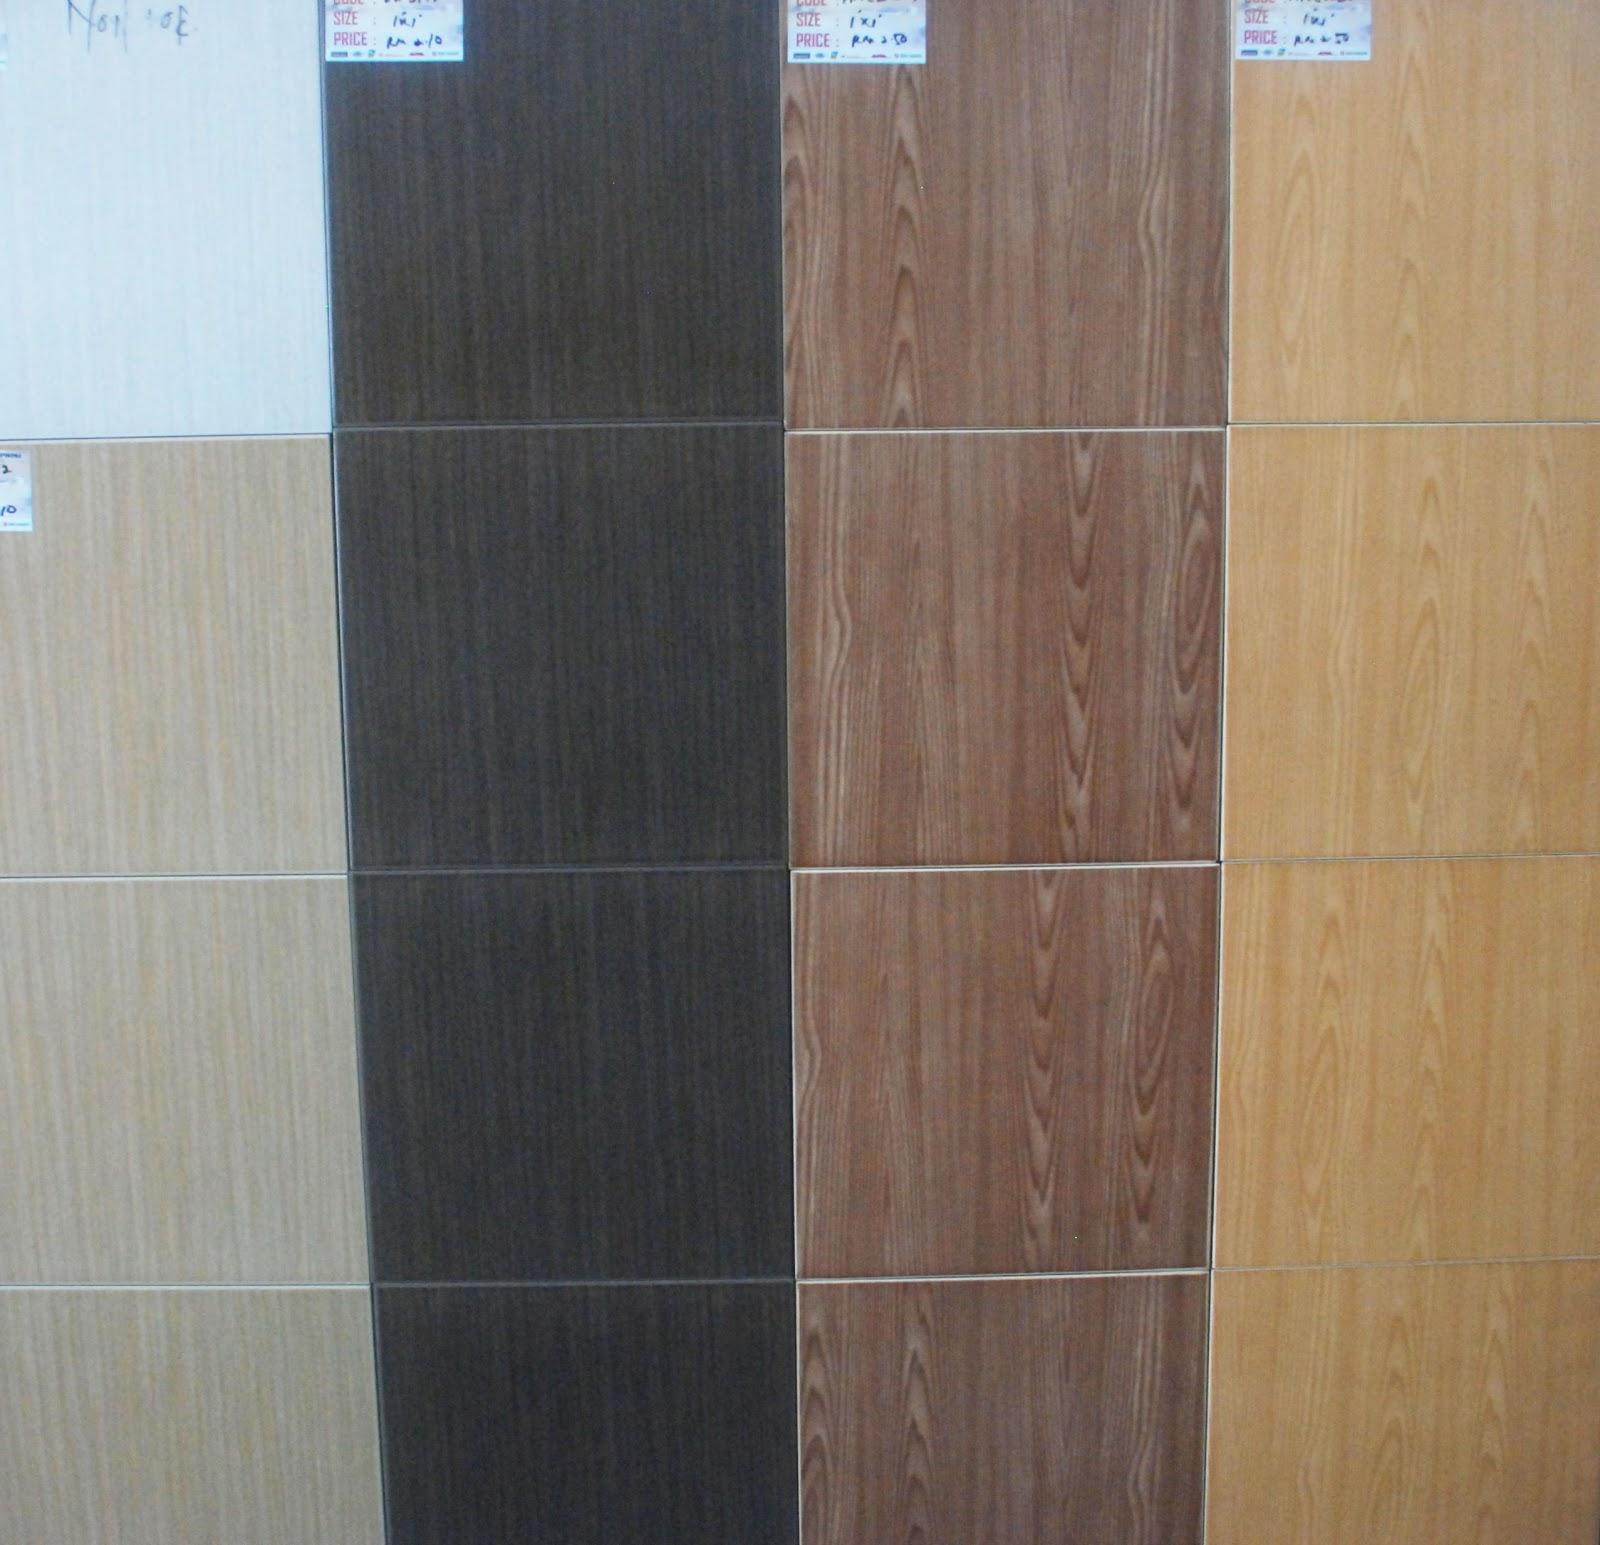 jualan produk jubin size 1 x 1 jernih tiling iv enterprise